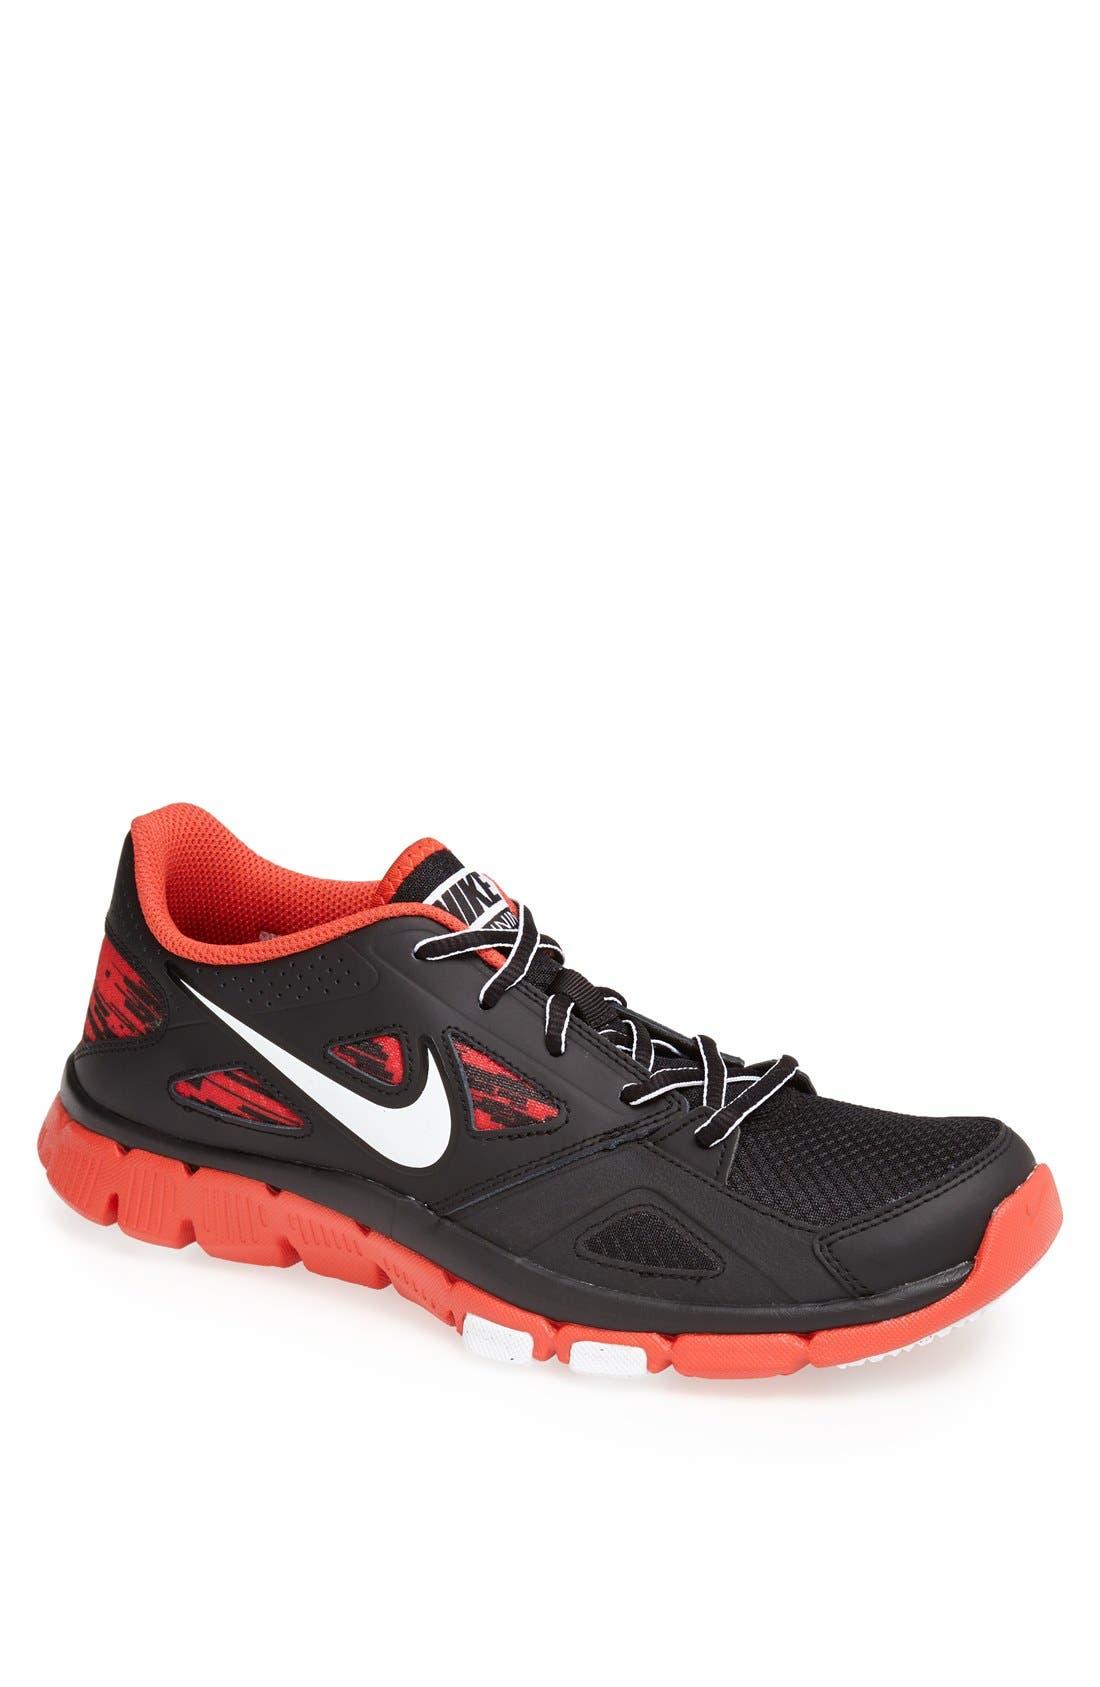 Main Image - Nike 'Flex Supreme TR 2' Training Shoe (Men)